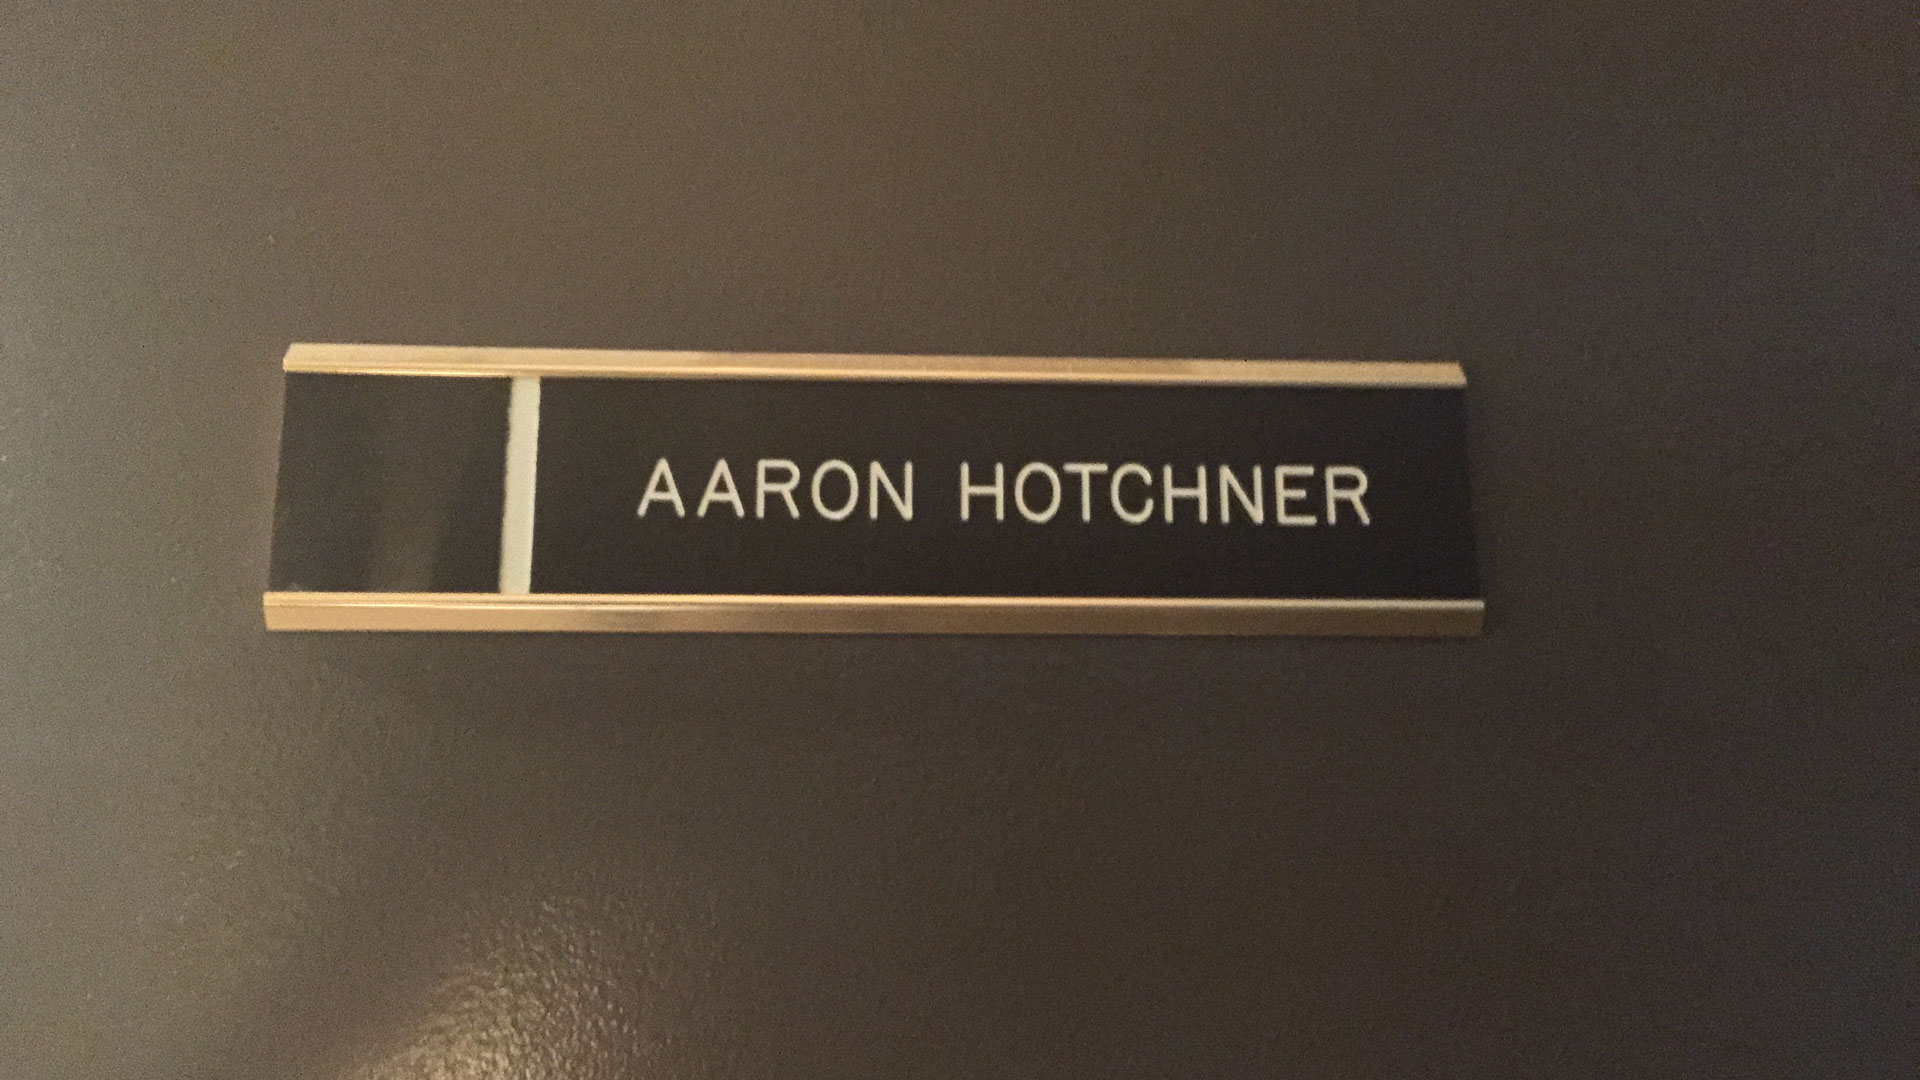 A closeup of SSA Aaron Hotchner's office door